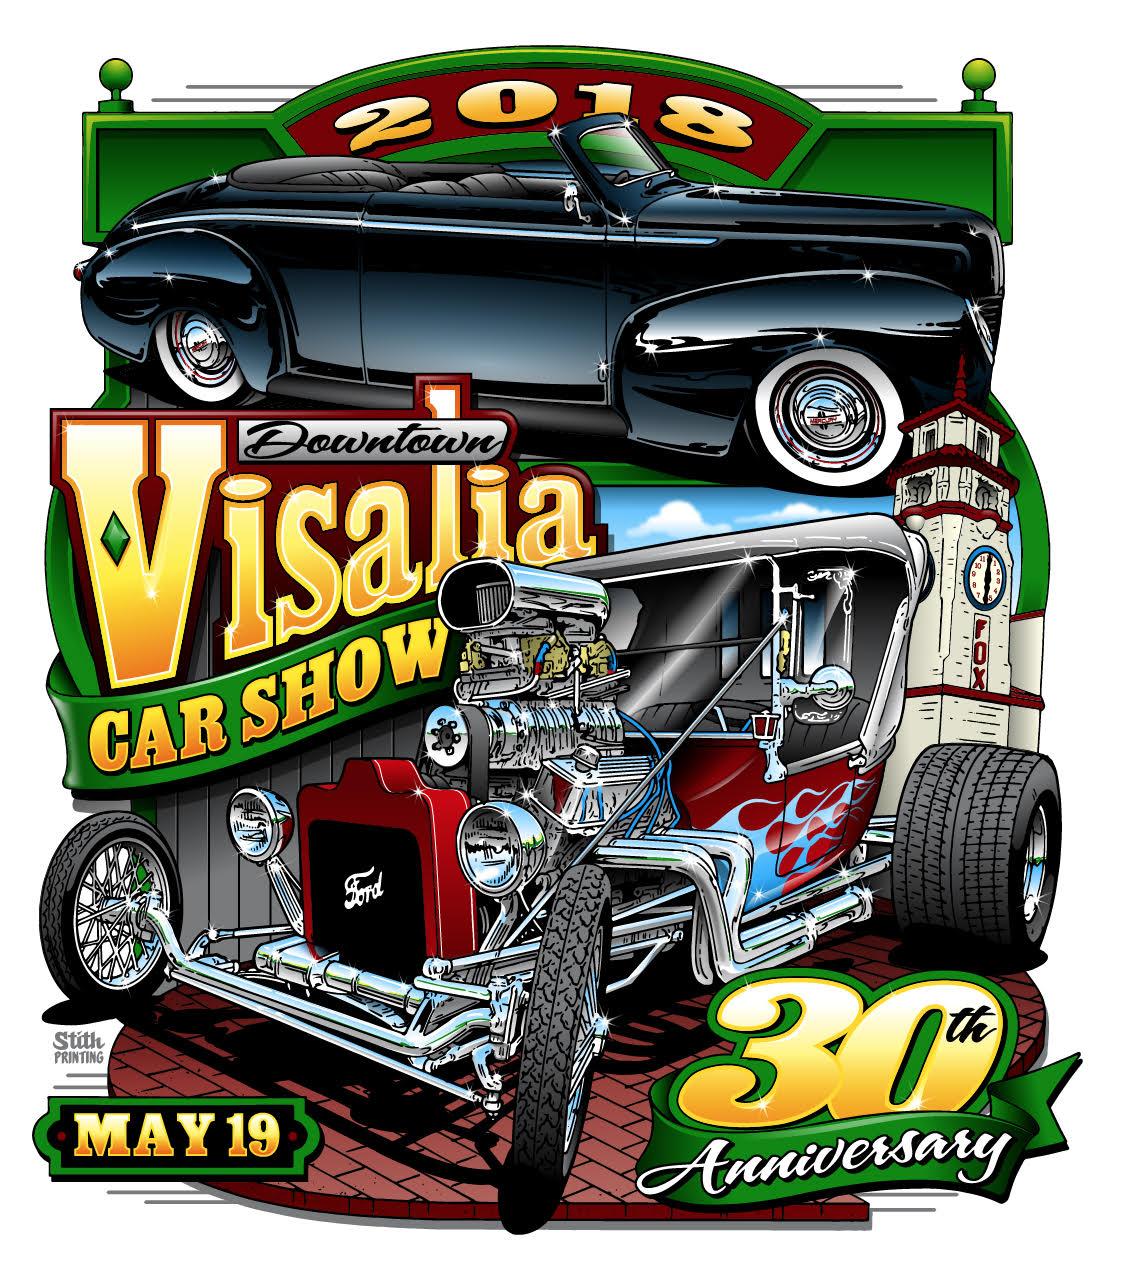 Downtown Visalia Th Annual Car Show ValleyPBS - Car show downtown